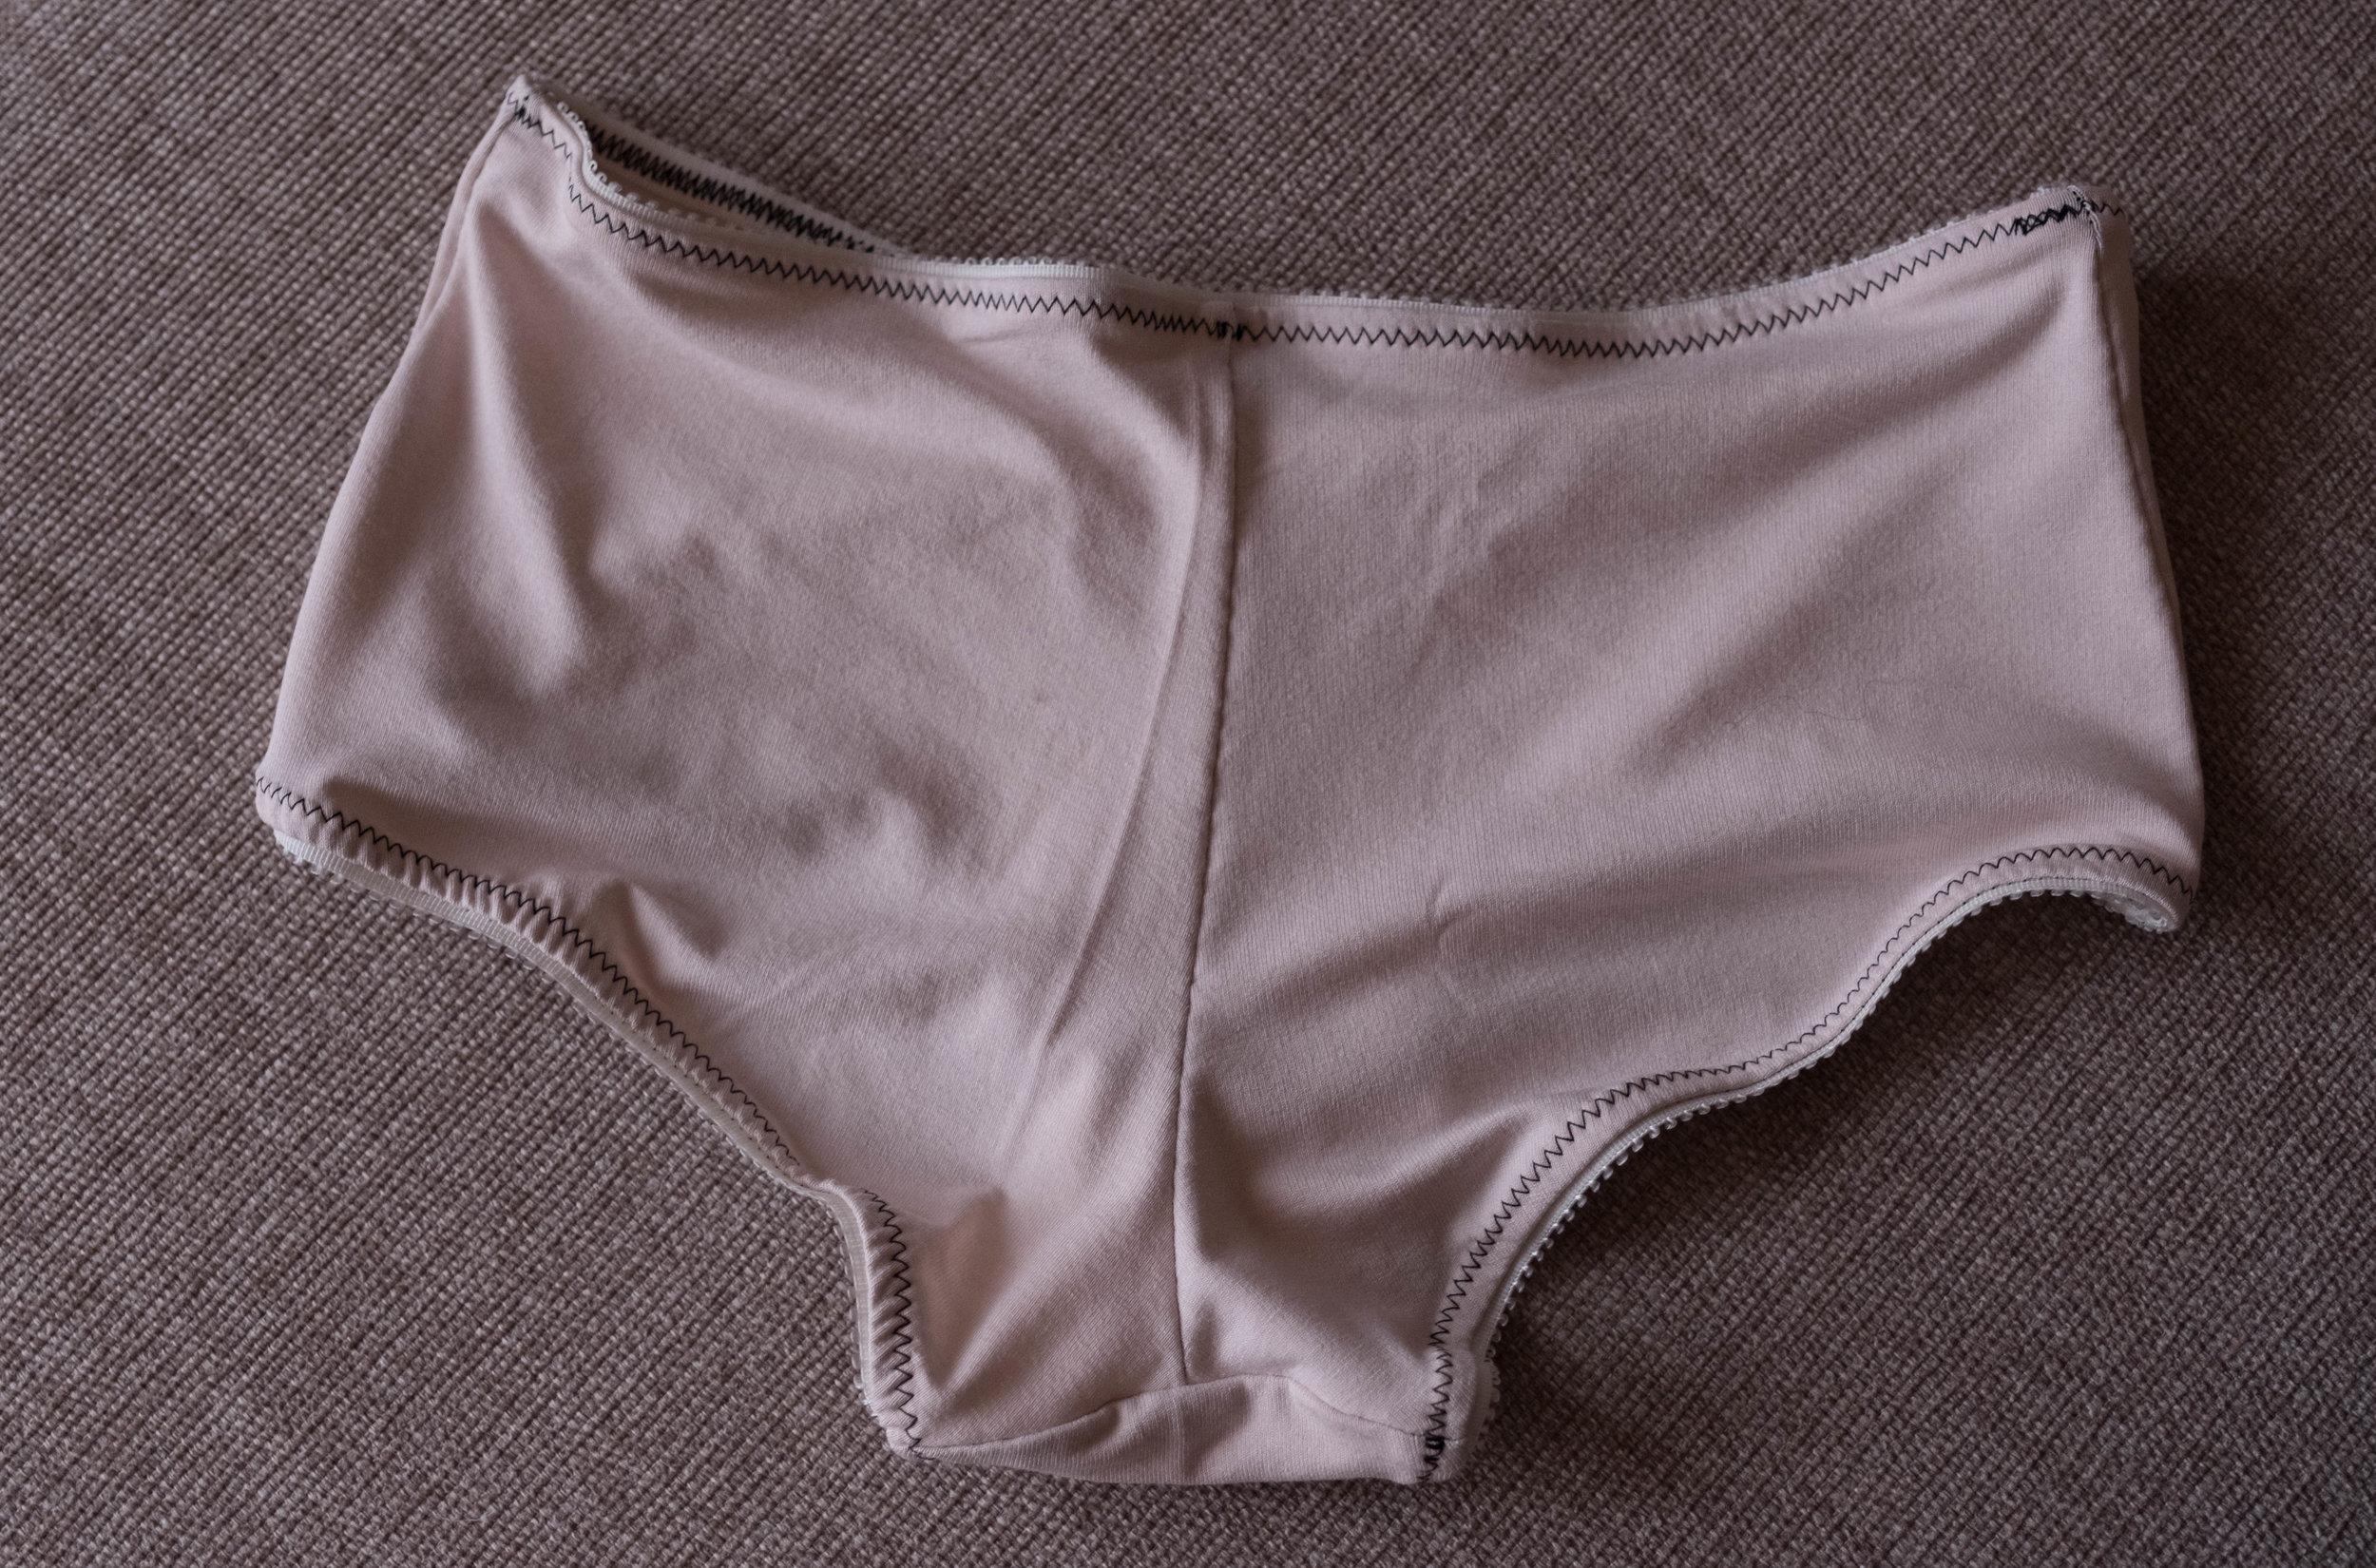 Mittsöm bak i ohhh lulu Lola Brazilian Panties